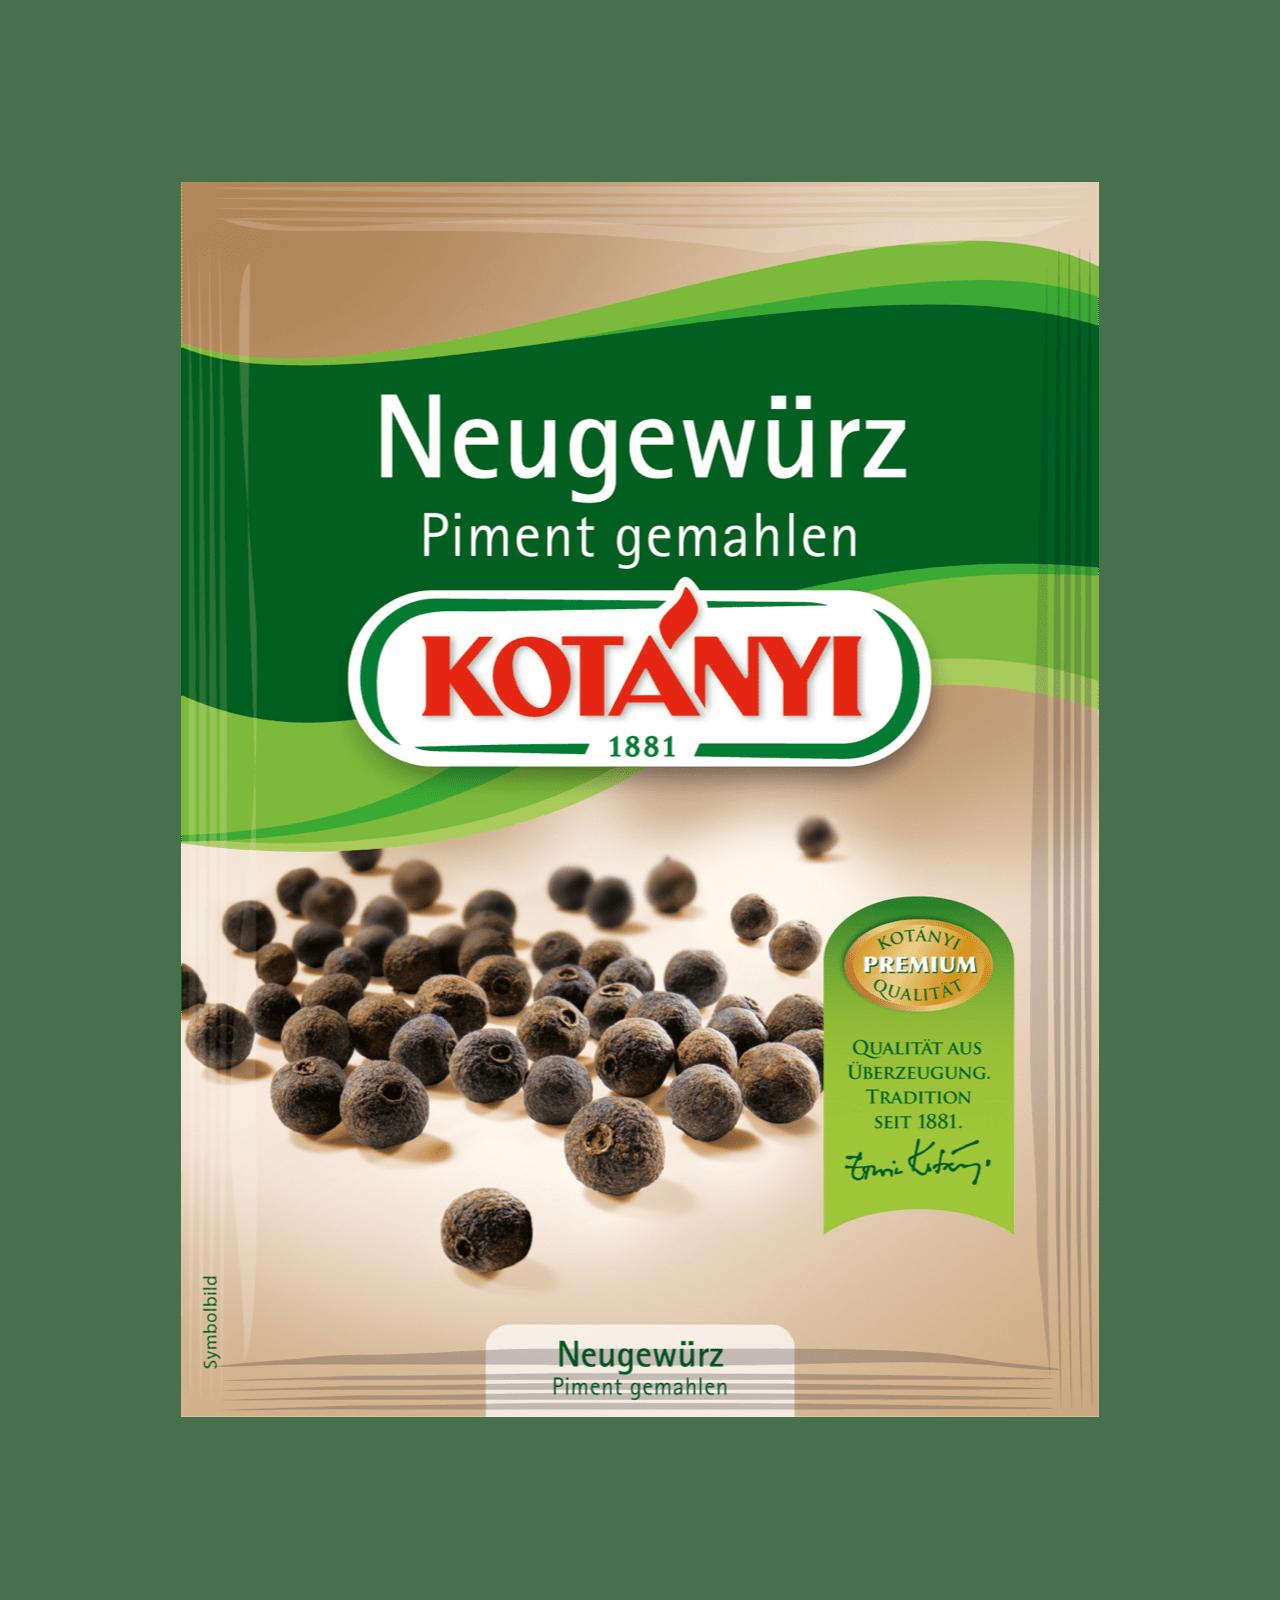 Kotányi Piment gemahlen im Brief